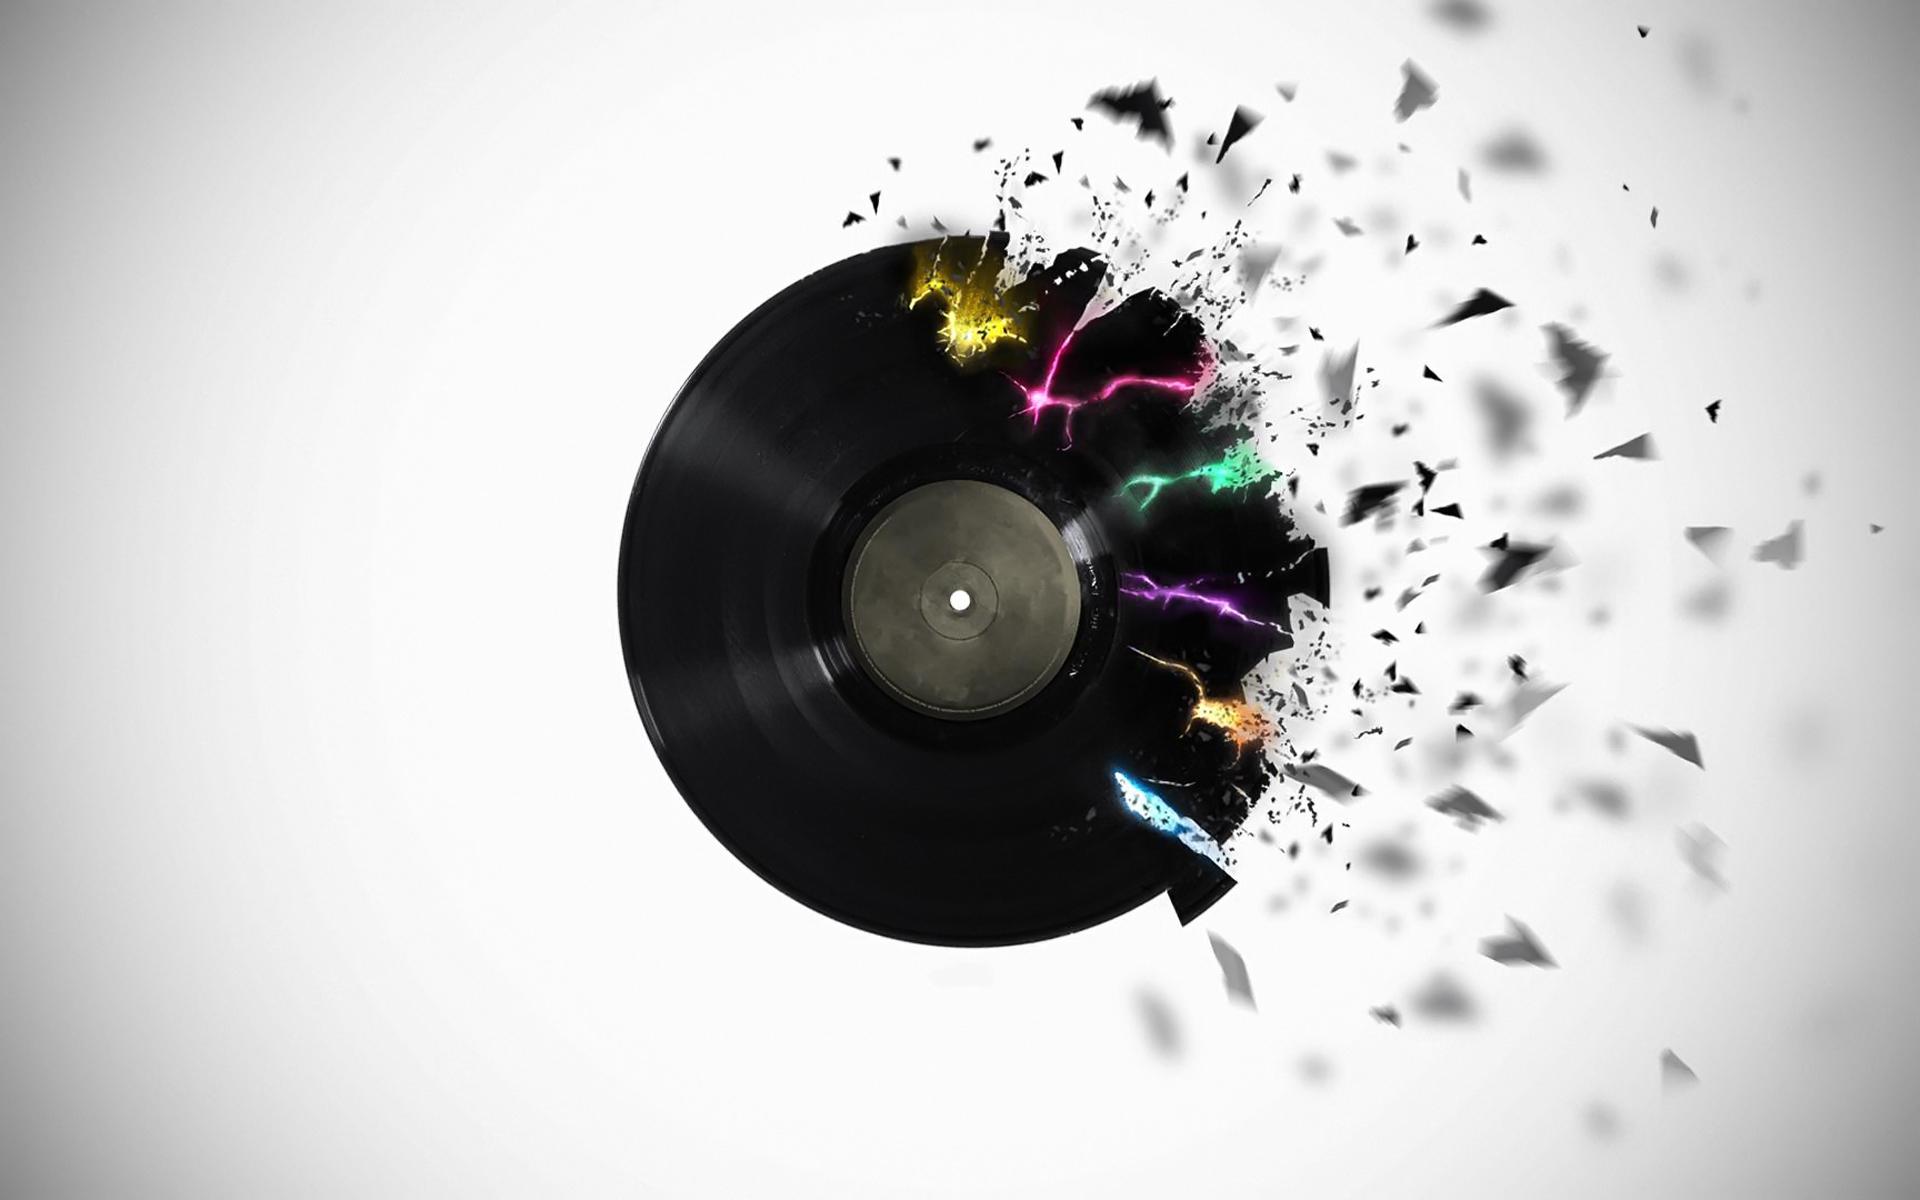 Abstract Music Wallpaper - WallpaperSafari